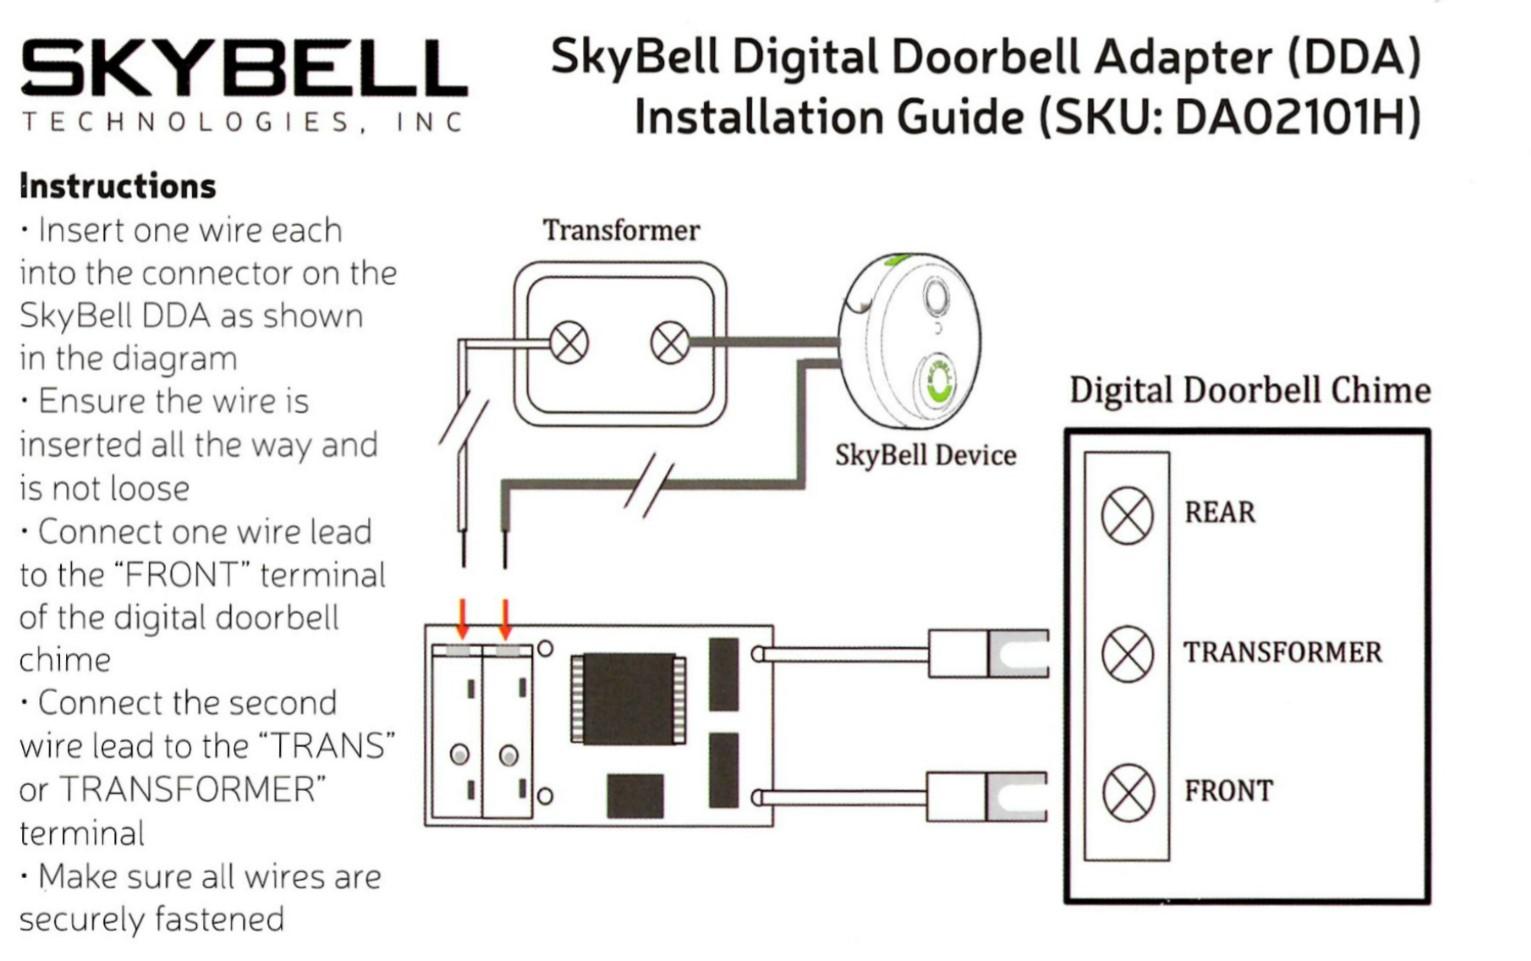 wiring diagram for doorbell transformer bremas reversing switch do i need a digital adapter? how install it? – skybell technologies